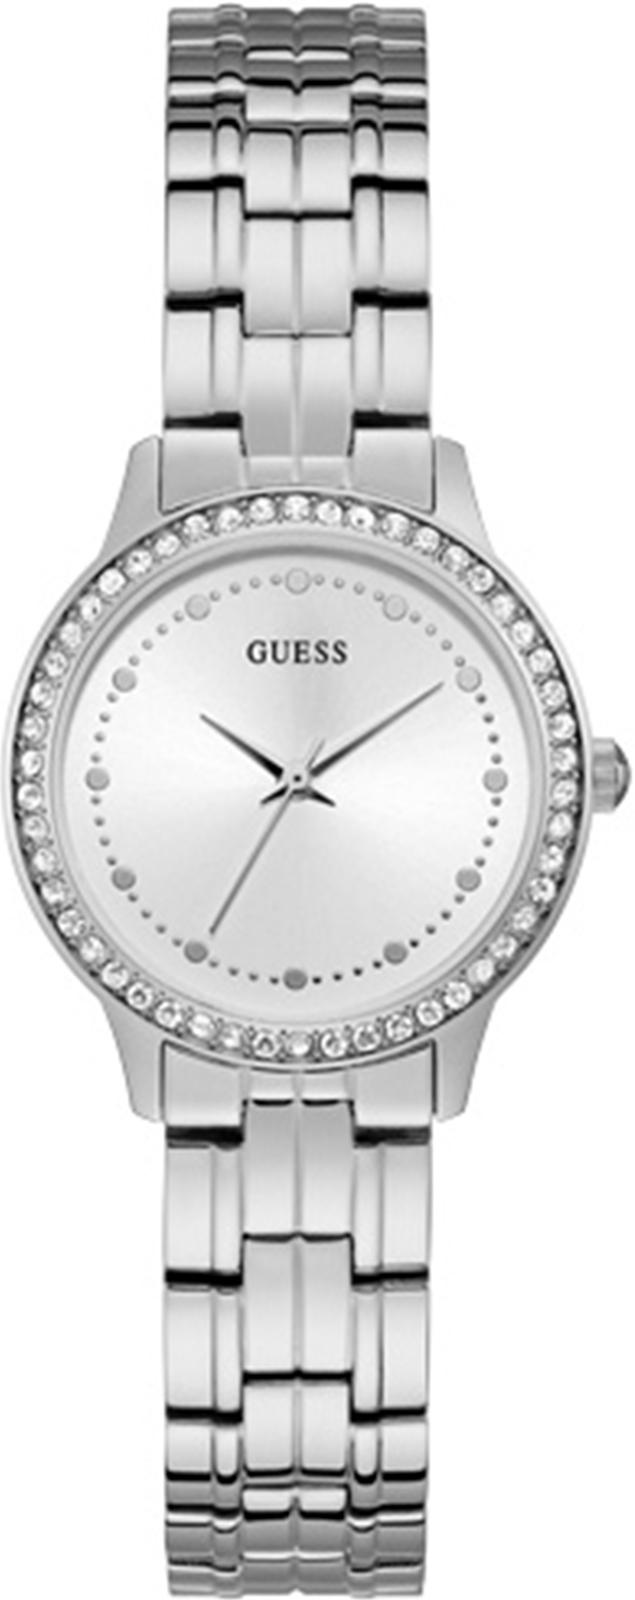 Часы Guess CHELSEA, серебристый цена и фото